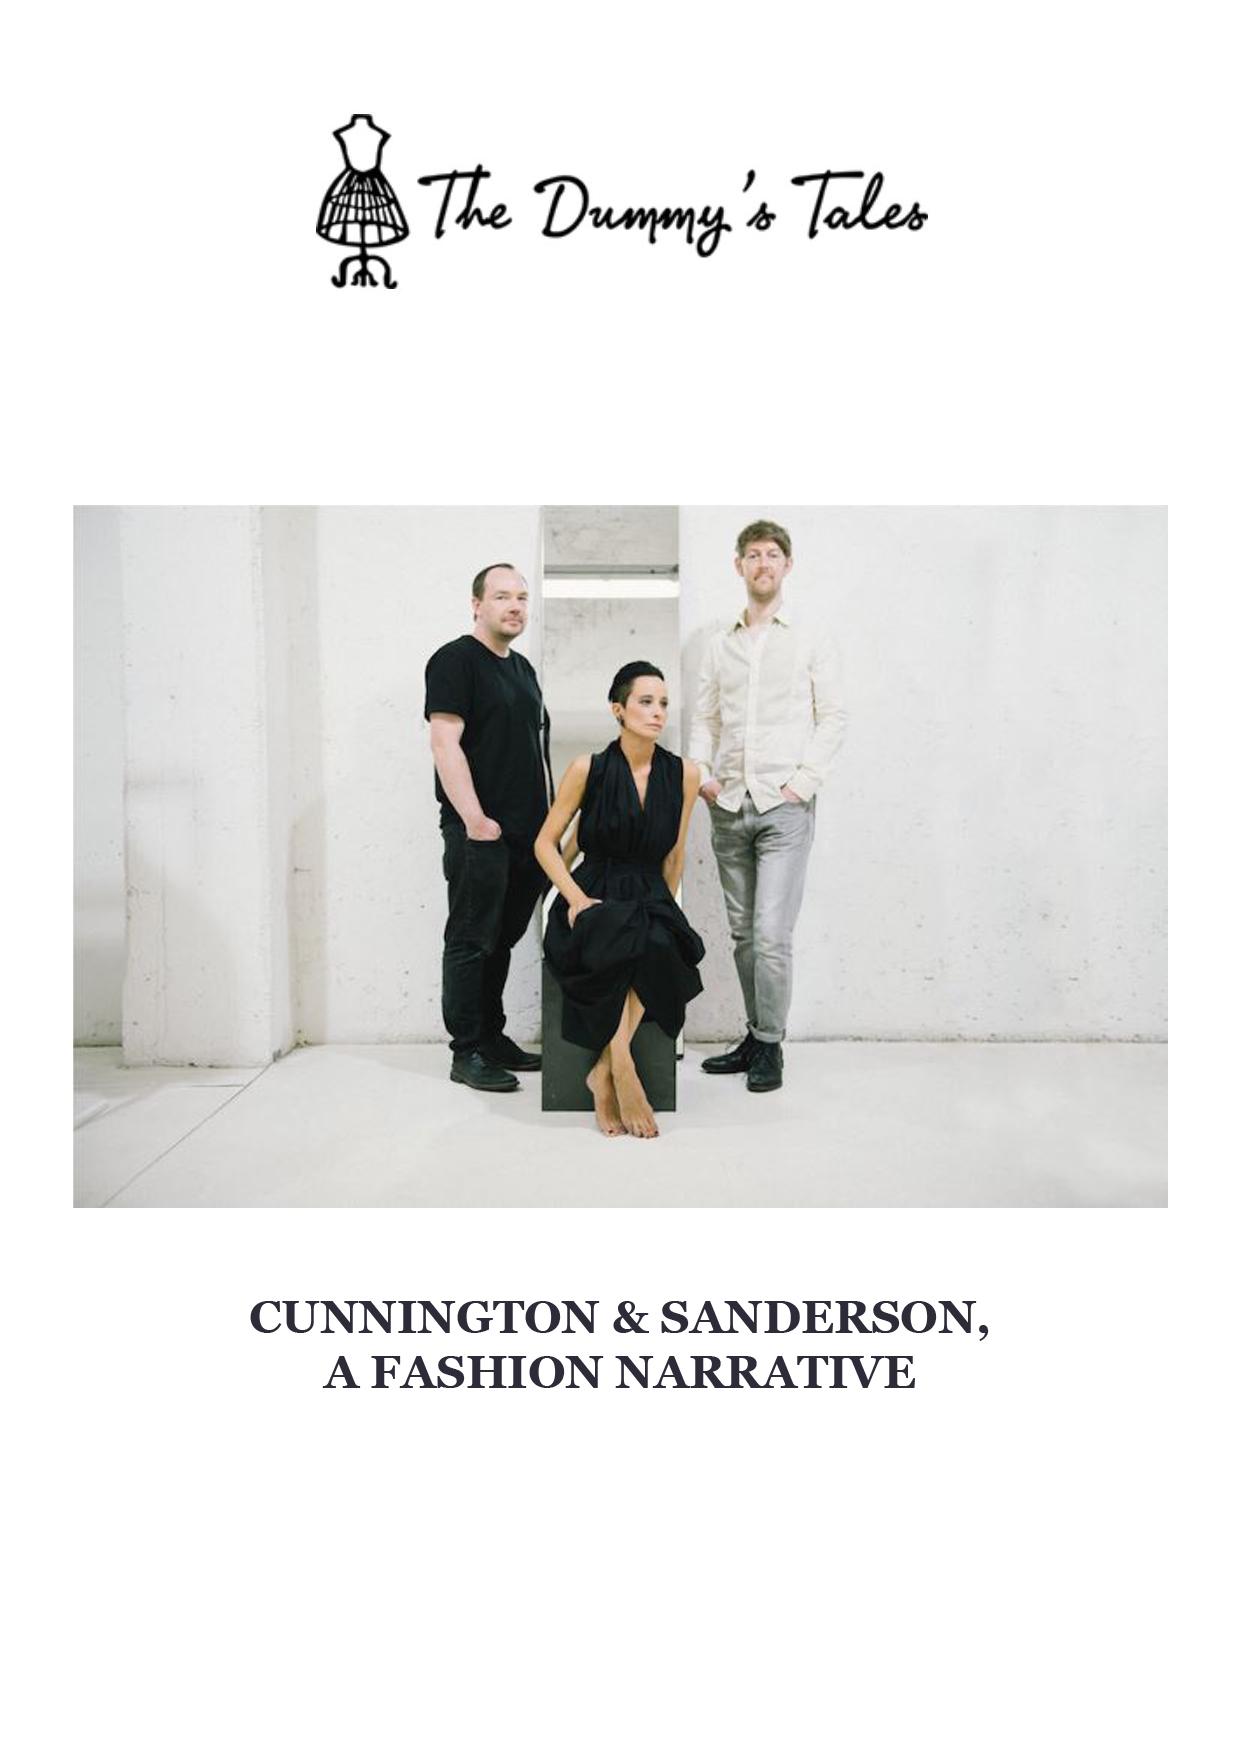 cunnington_&_sanderson_the_dummys_tales_